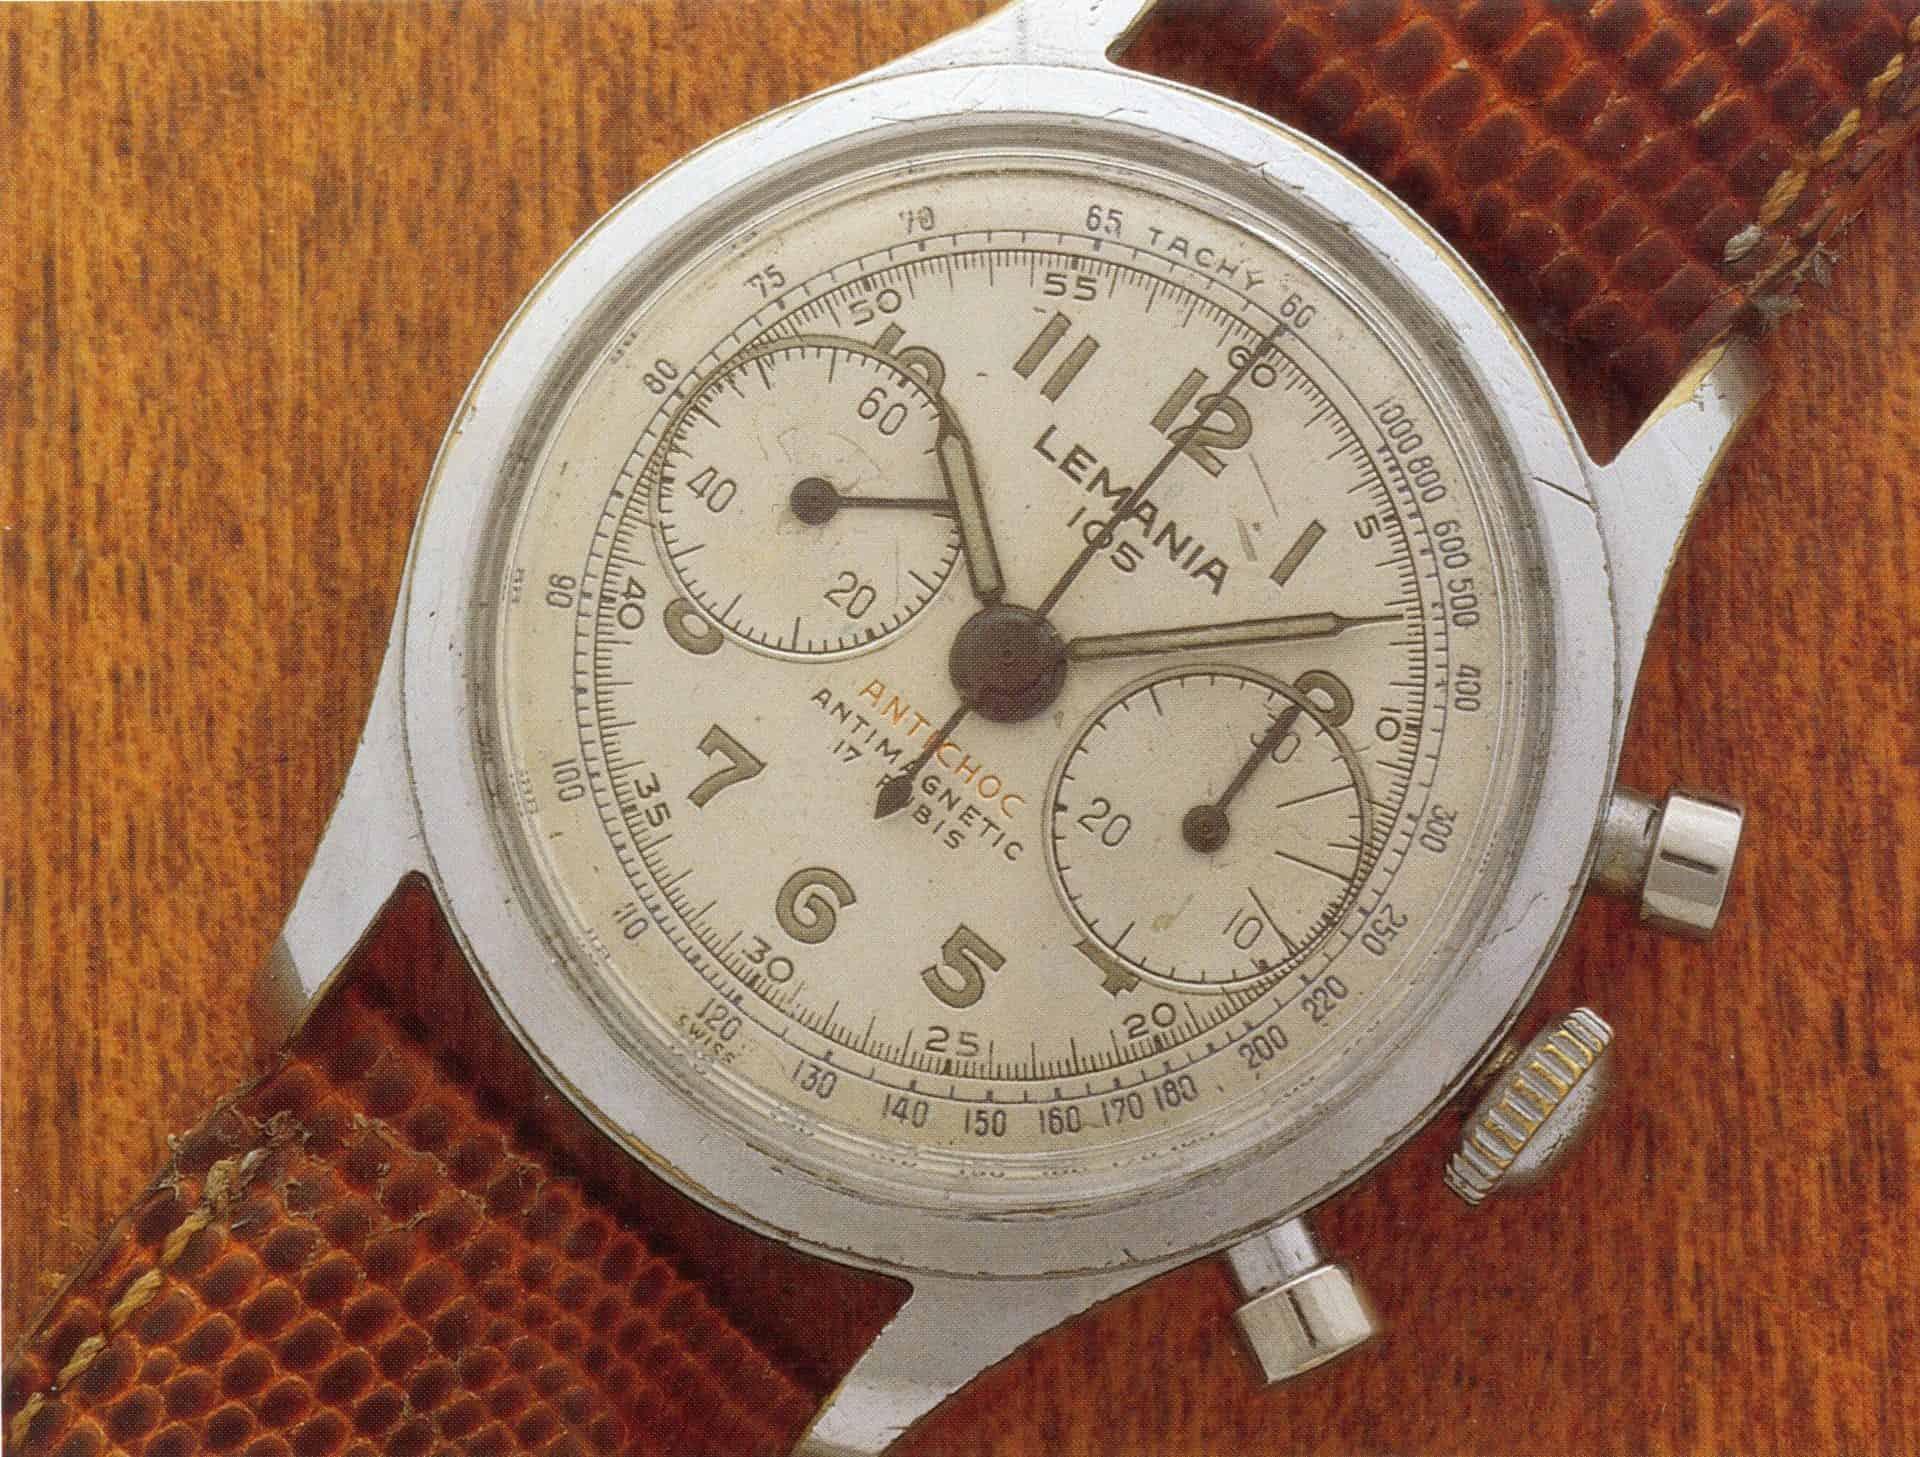 Lemania 105 Chronograph ca 1950 verchromtes Messing